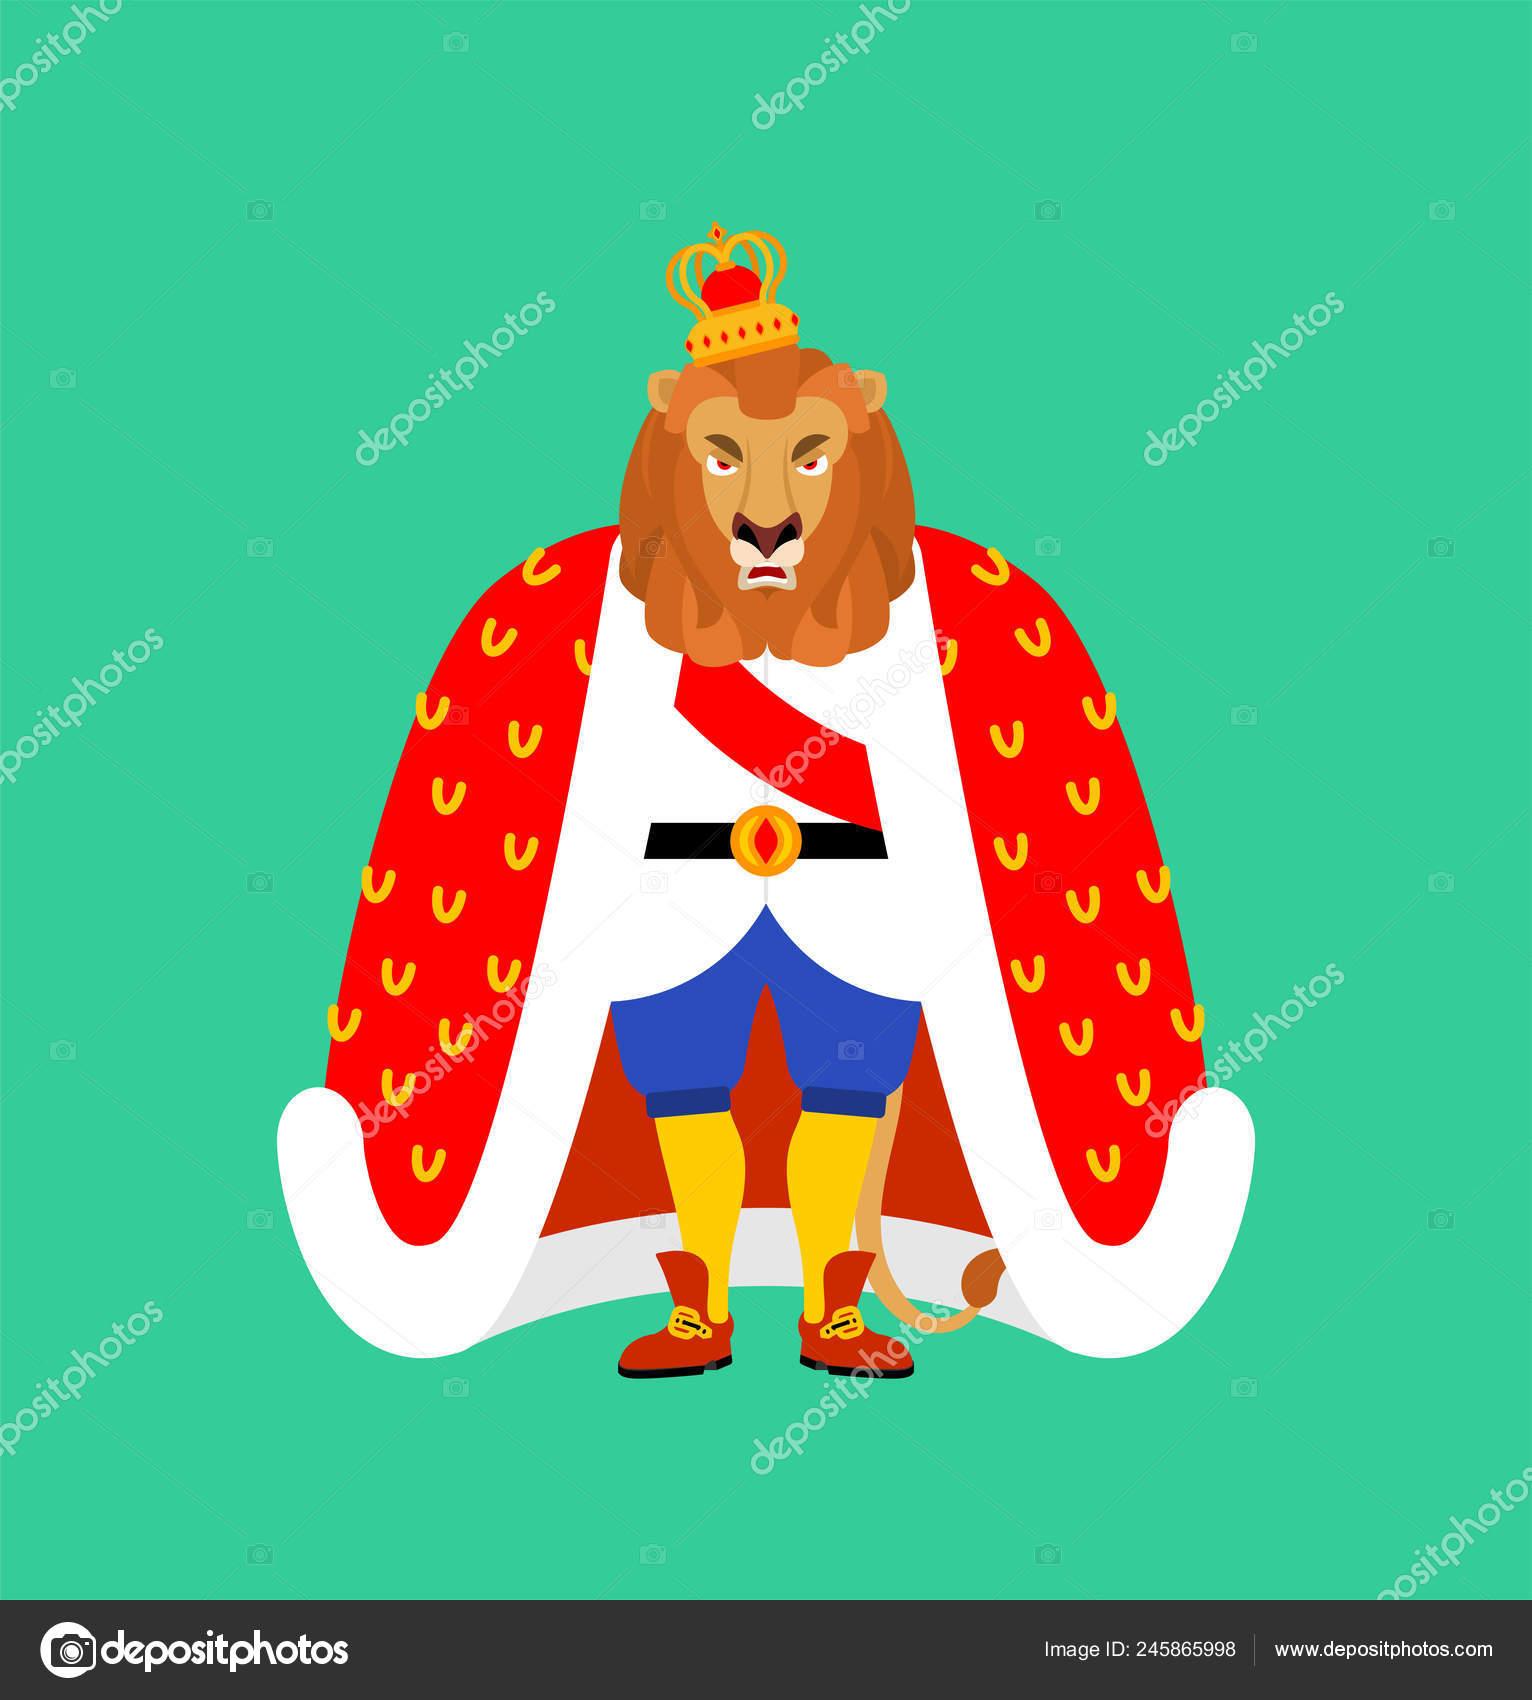 Lion King Animals Leo Crown Stock Vector C Popaukropa 245865998 Download king crown stock vectors. https depositphotos com 245865998 stock illustration lion king animals leo crown html